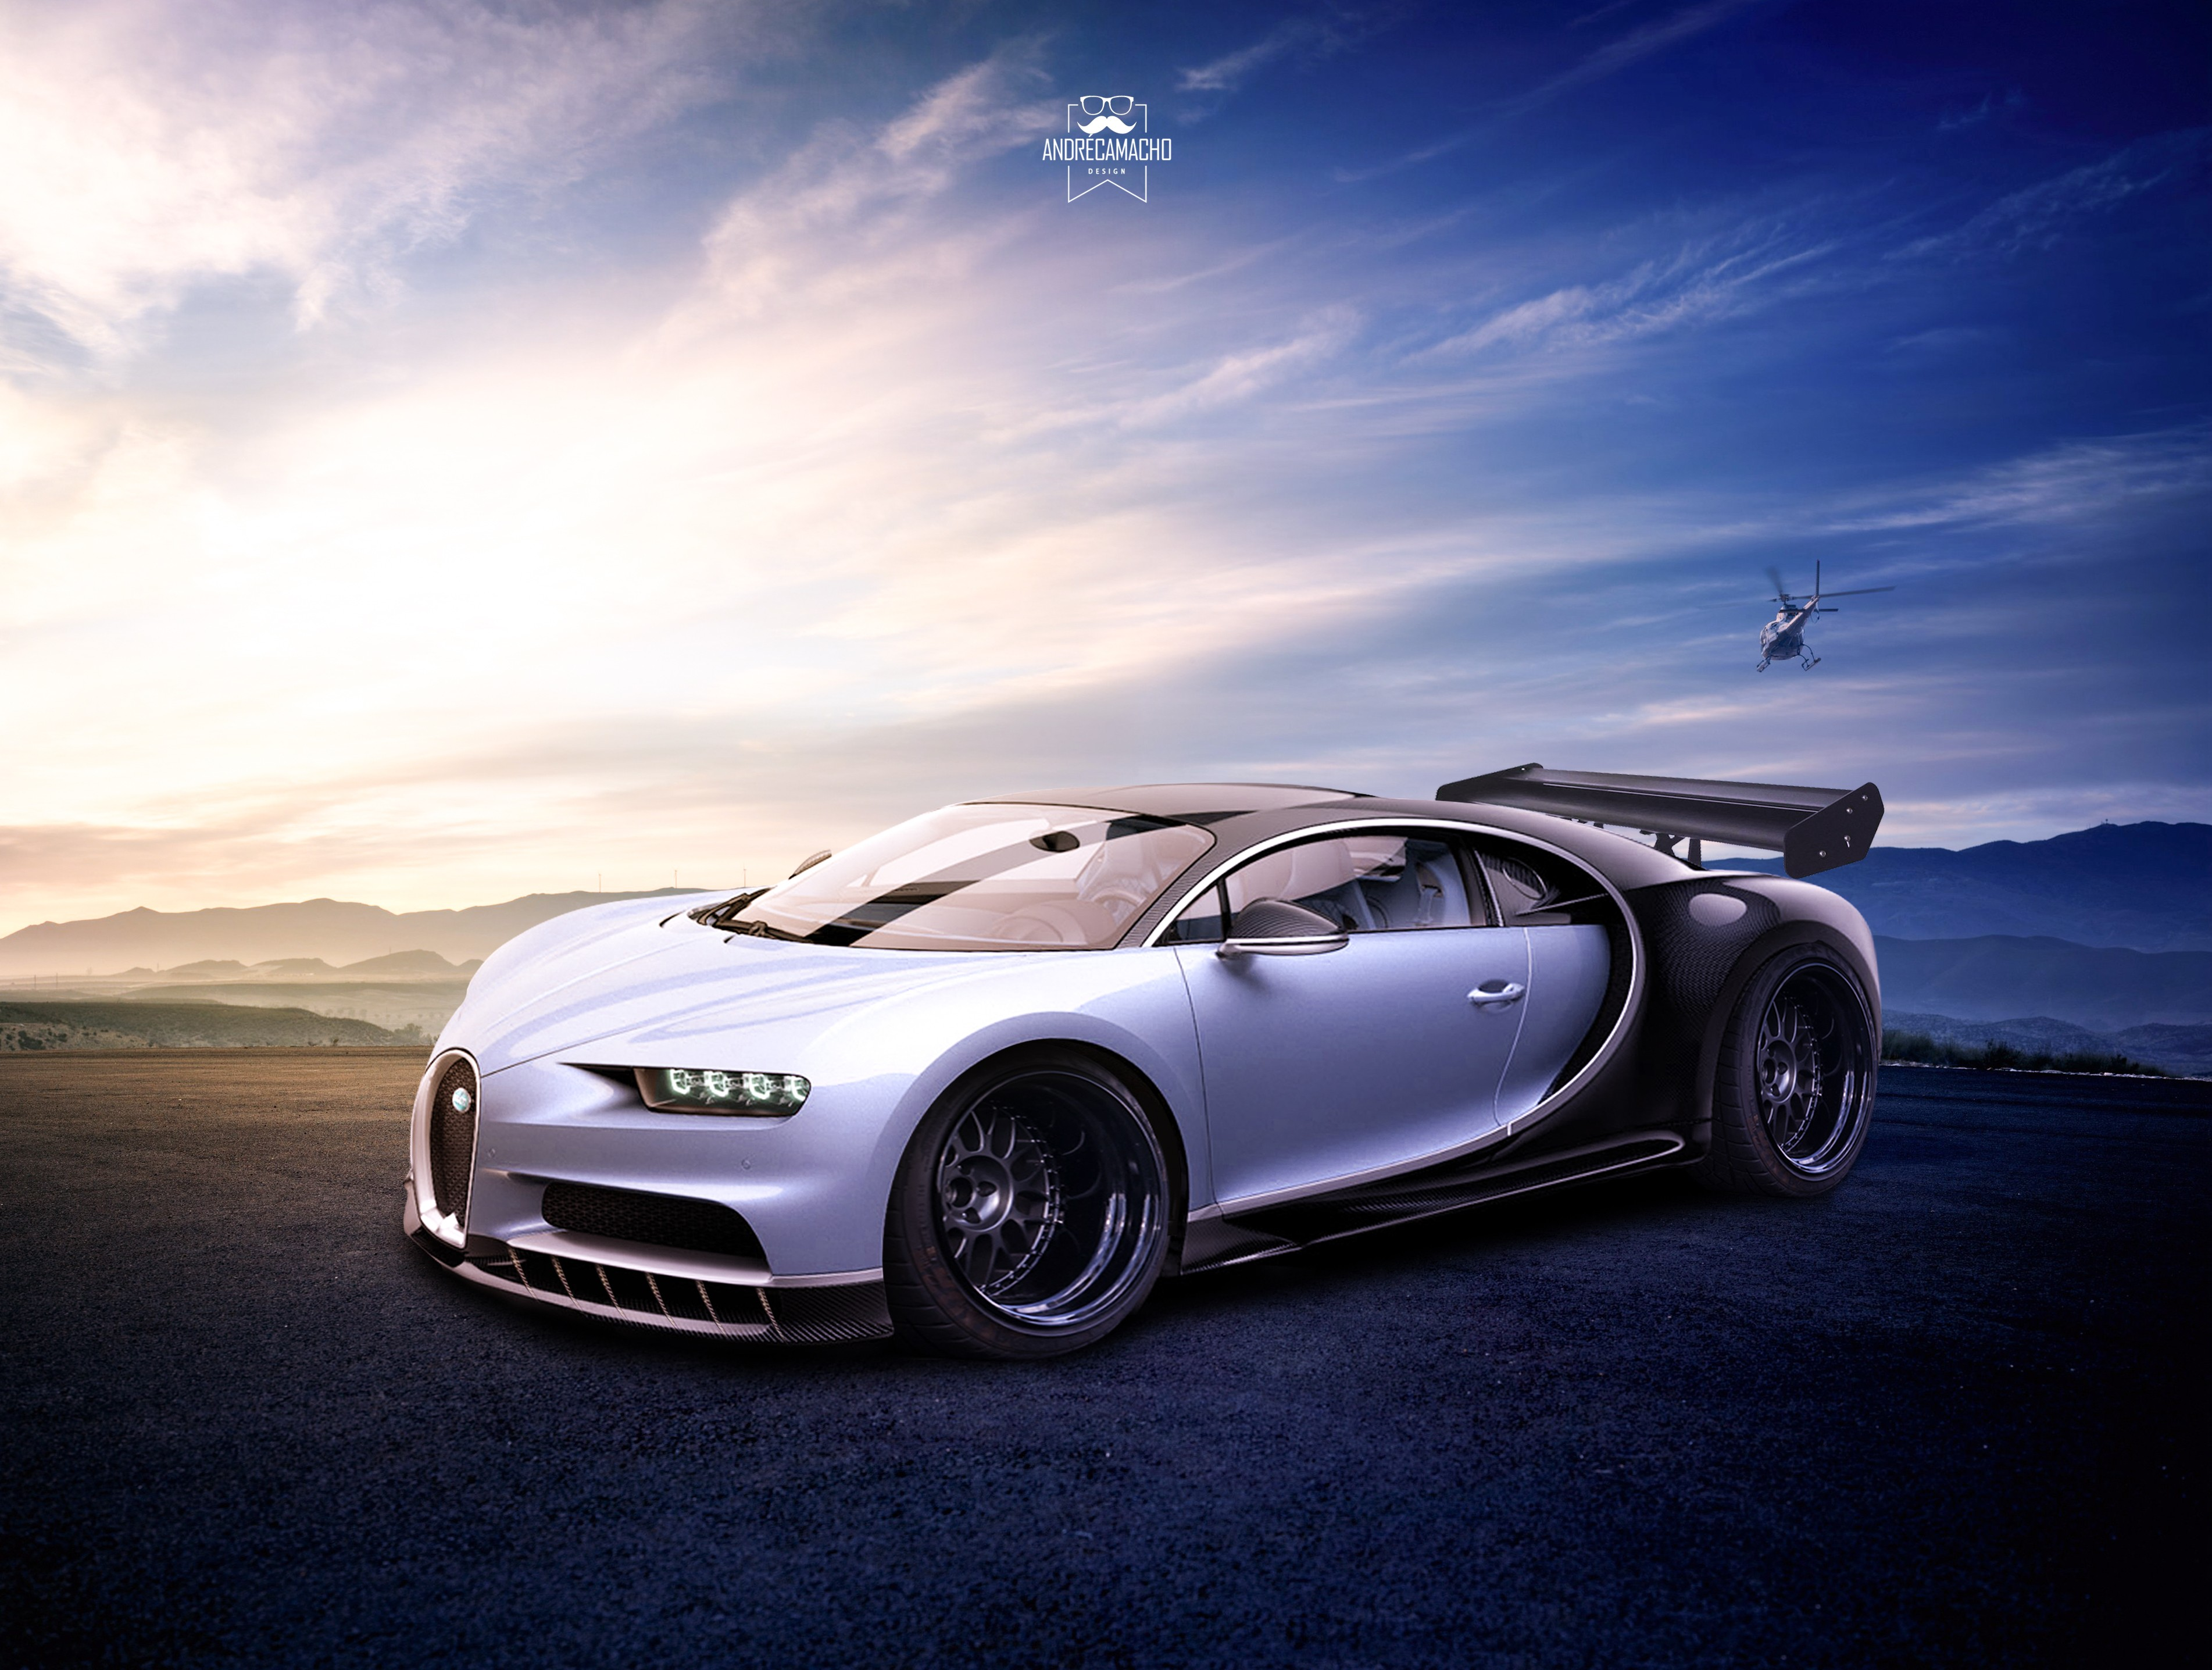 Bugatti Chiron Sport Iphone Wallpaper: 640x960 Bugatti Chiron IPhone 4, IPhone 4S HD 4k